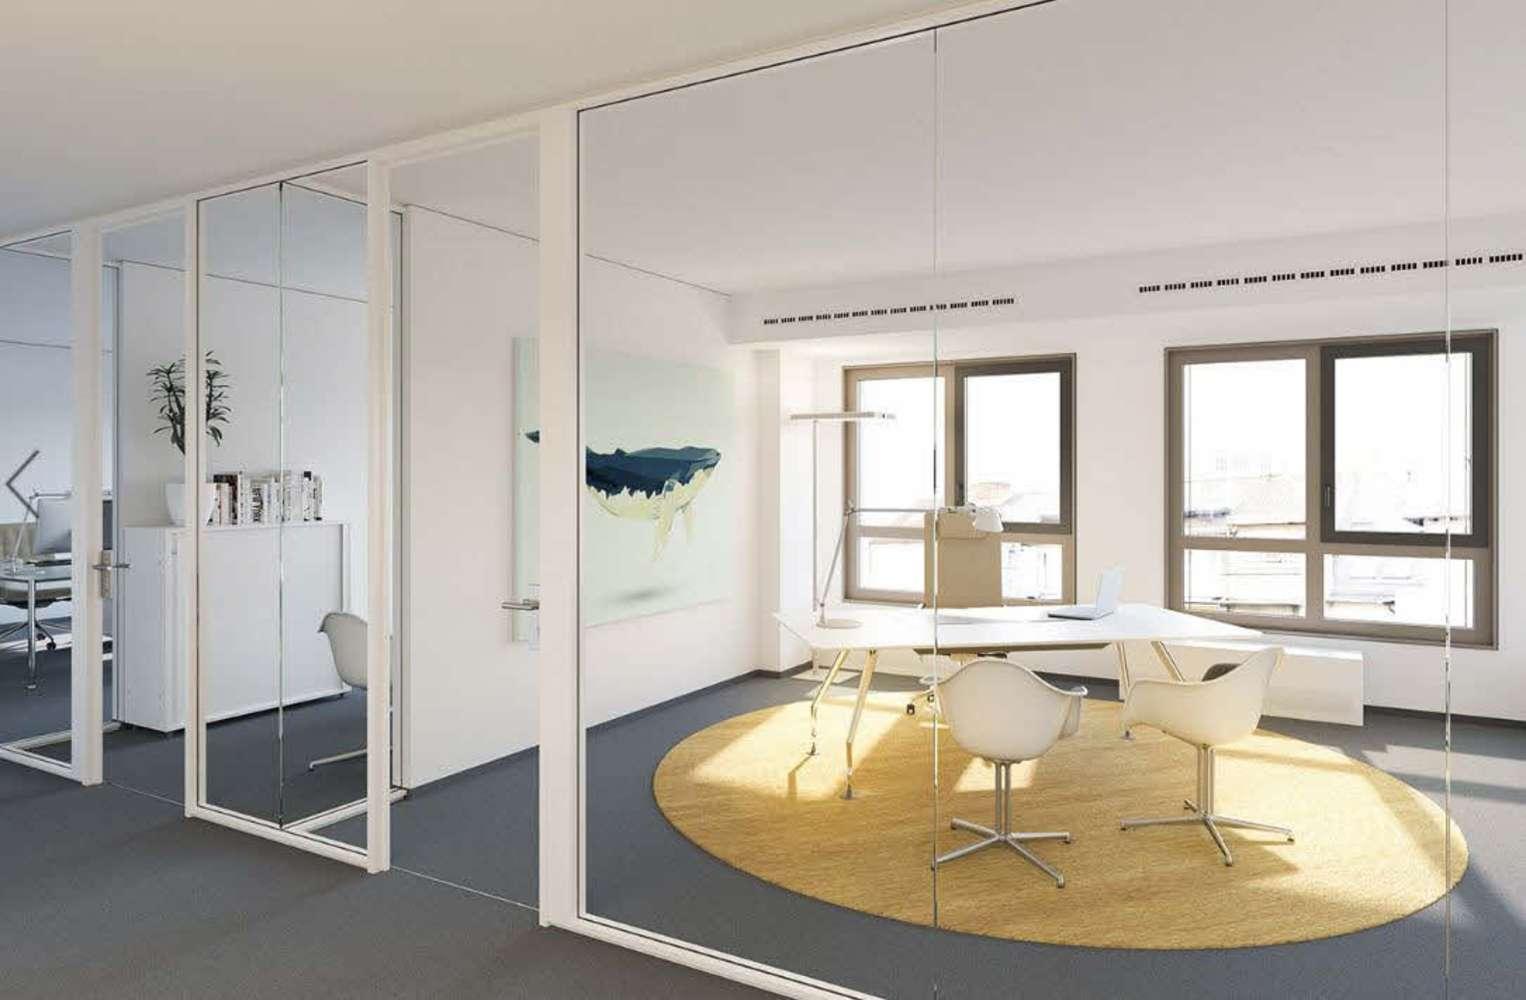 Büros Frankfurt am main, 60329 - Büro - Frankfurt am Main, Bahnhofsviertel - F1292 - 9416766